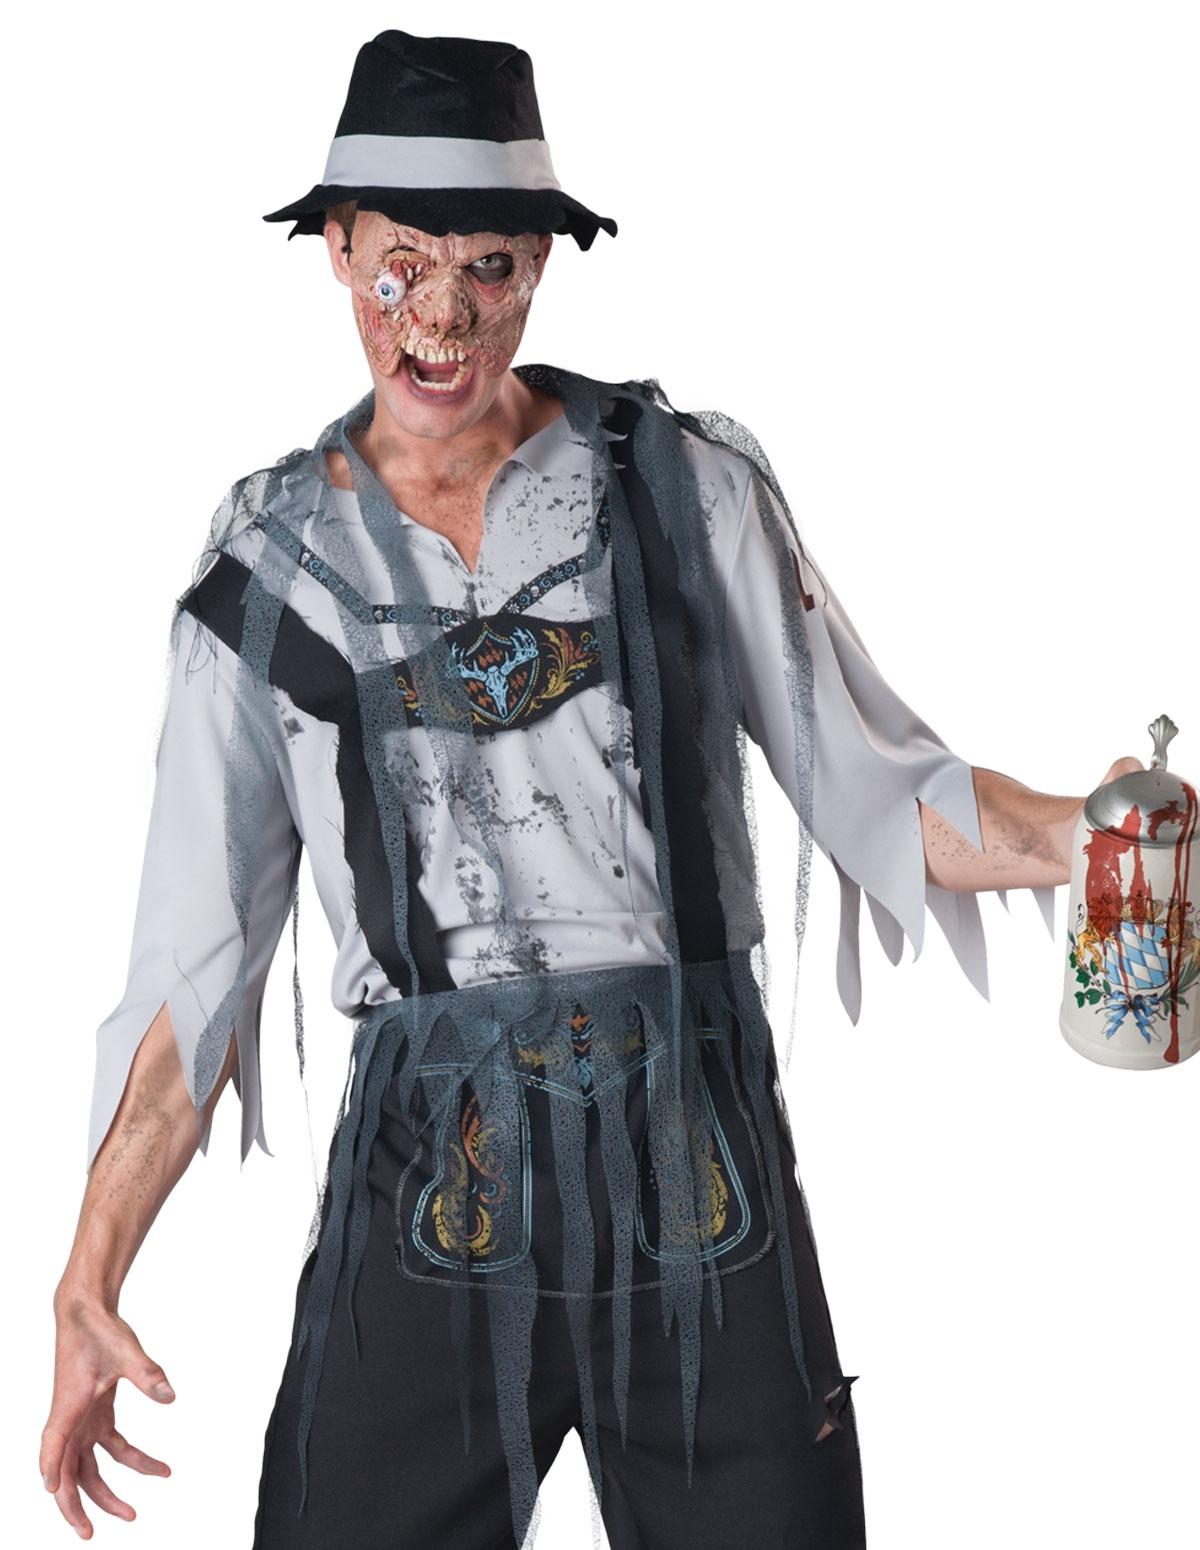 Oktoberfeast Zombie Lederhosen Costume